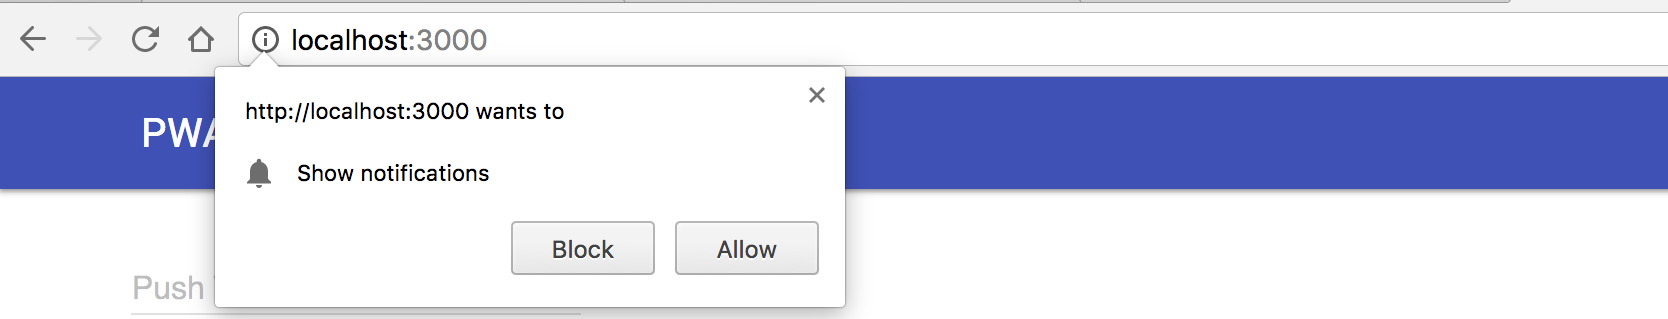 Figure 1: Notification authorization request